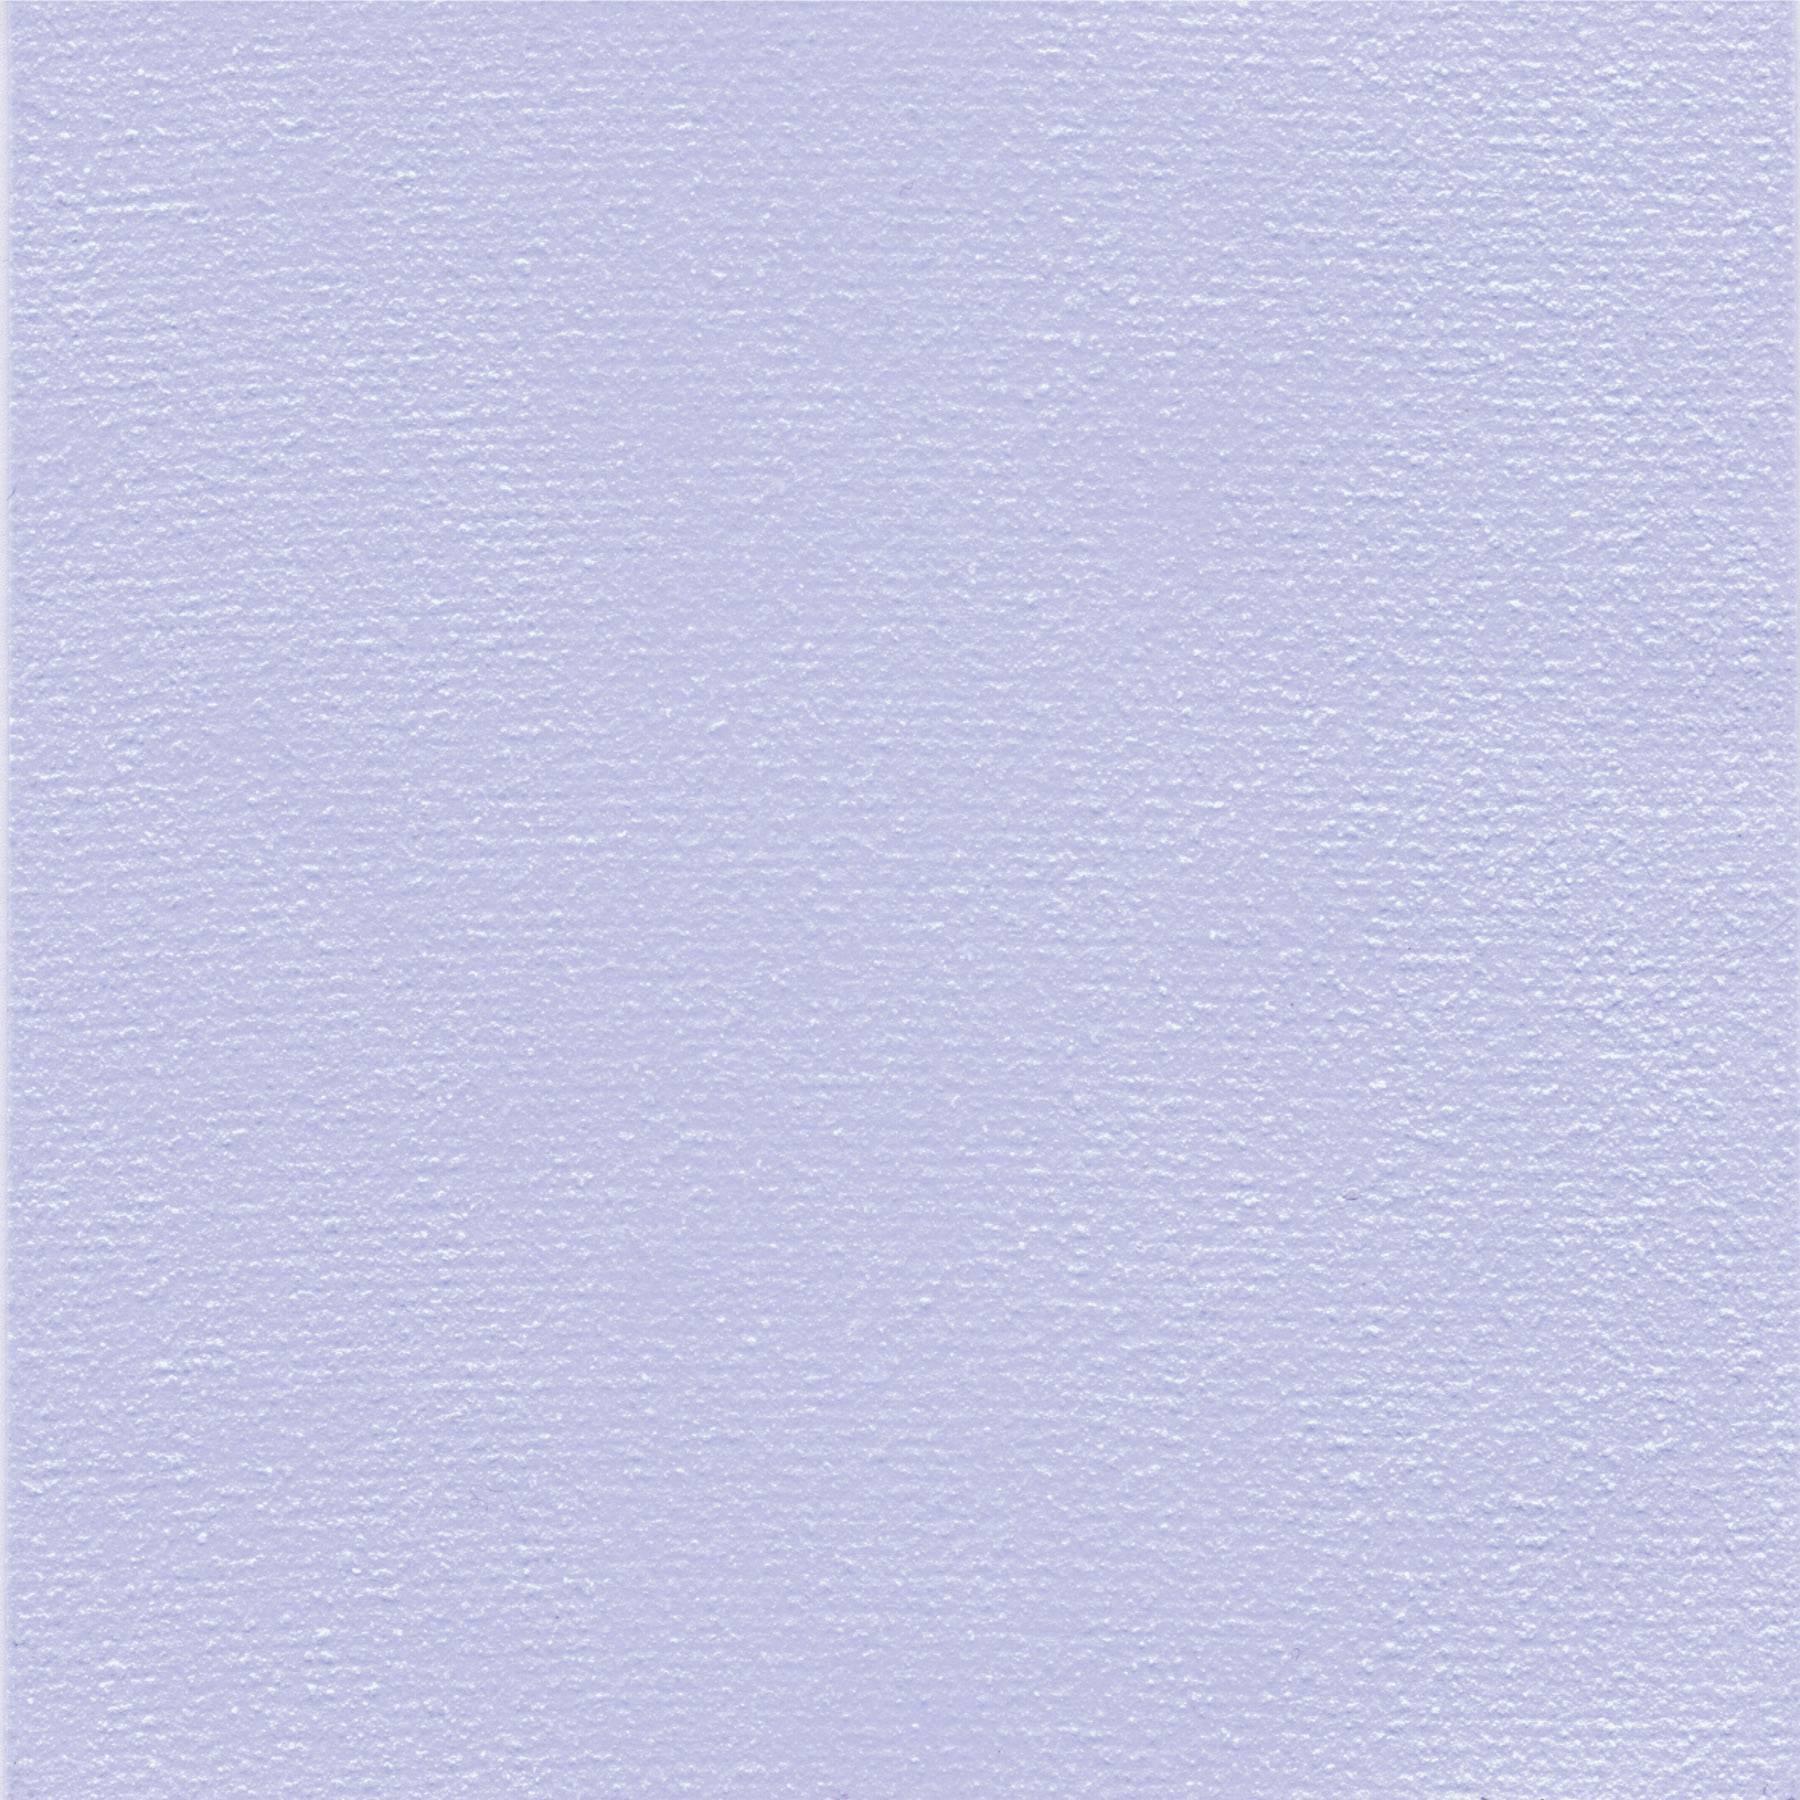 Teplovodivá fólia Kerafol SOFTTHERM 86/300, 1 mm, 3 W/mK, (d x š) 200 mm x 120 mm